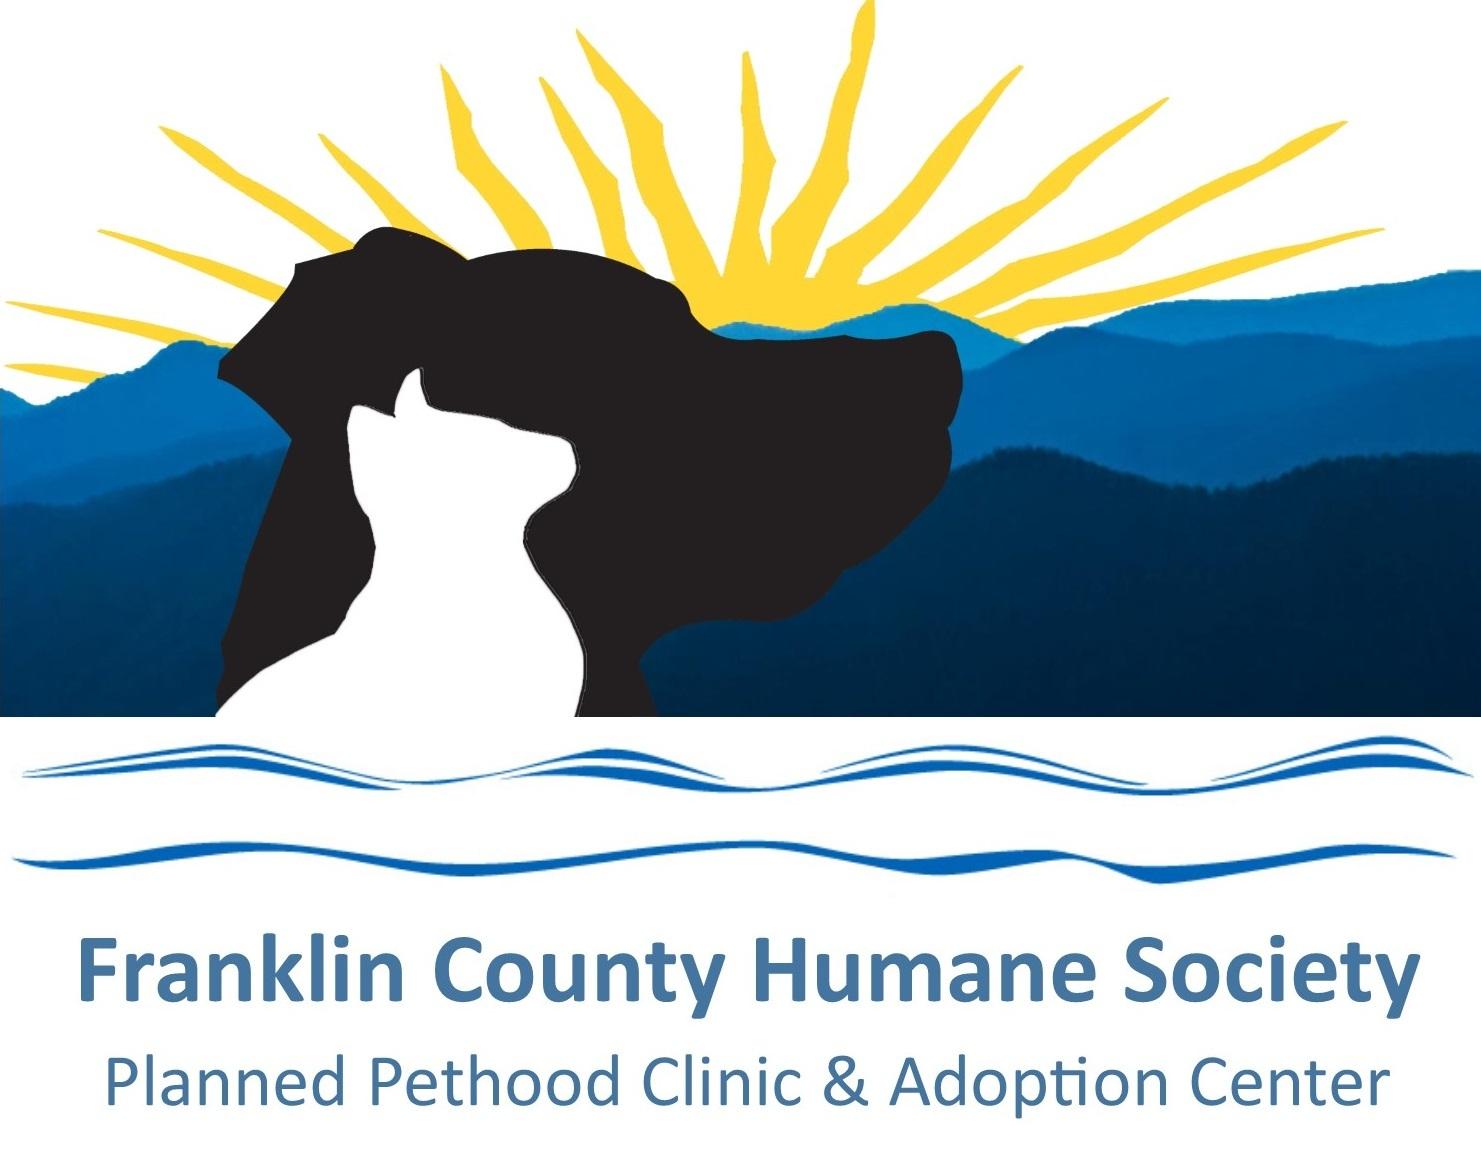 Franklin County Humane Society logo